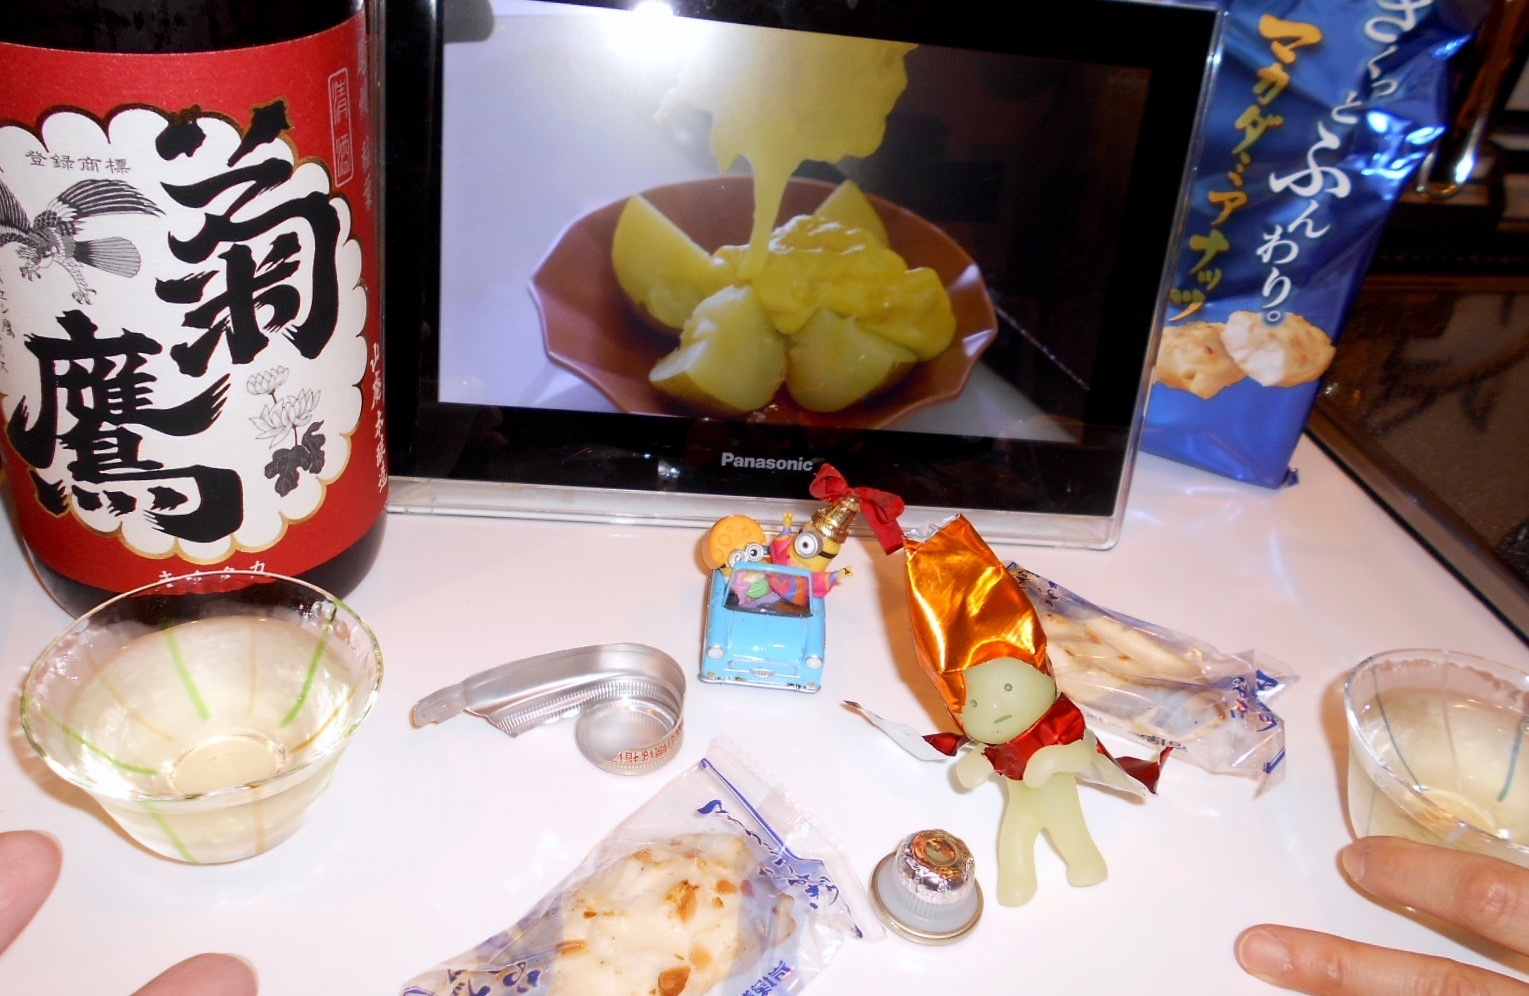 kikutaka_hiyoku29by3.jpg